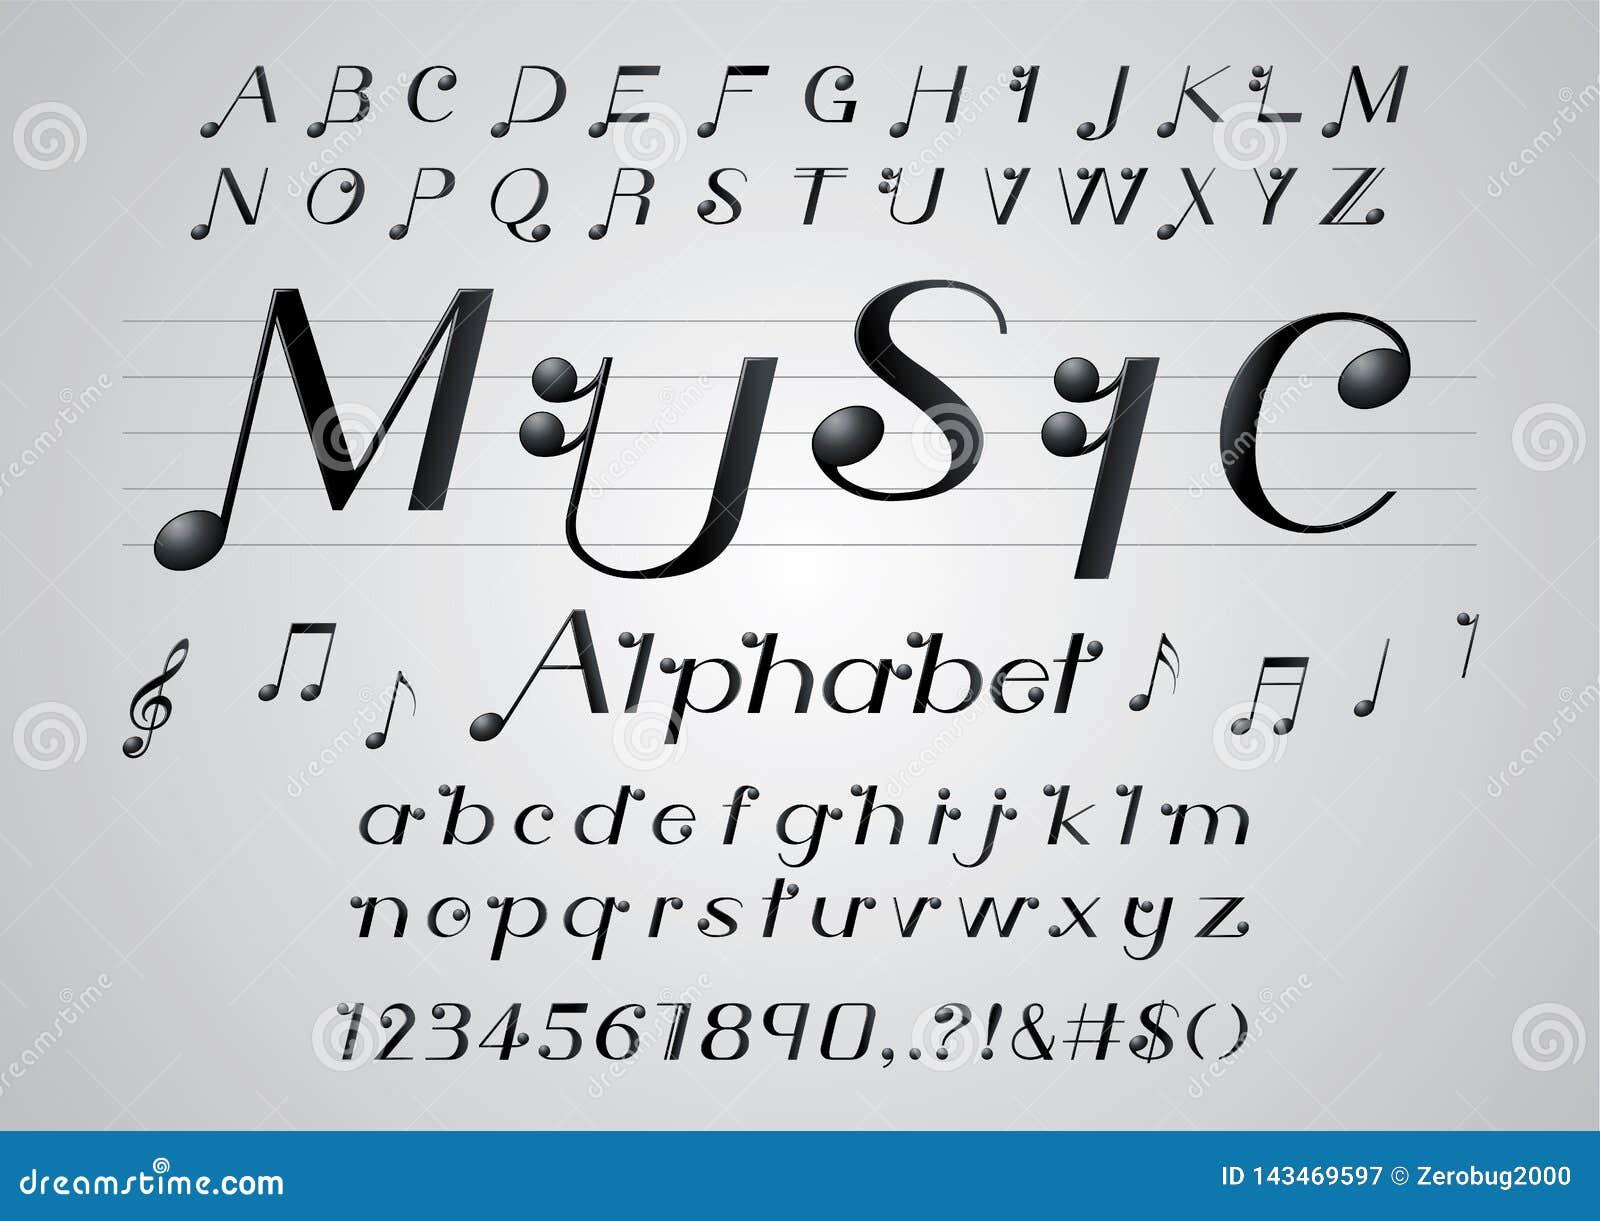 font music notes note alphabet musical fonts vector letters fonte musica fuente letter della shutterstock lettering nota text alfabeto vektor